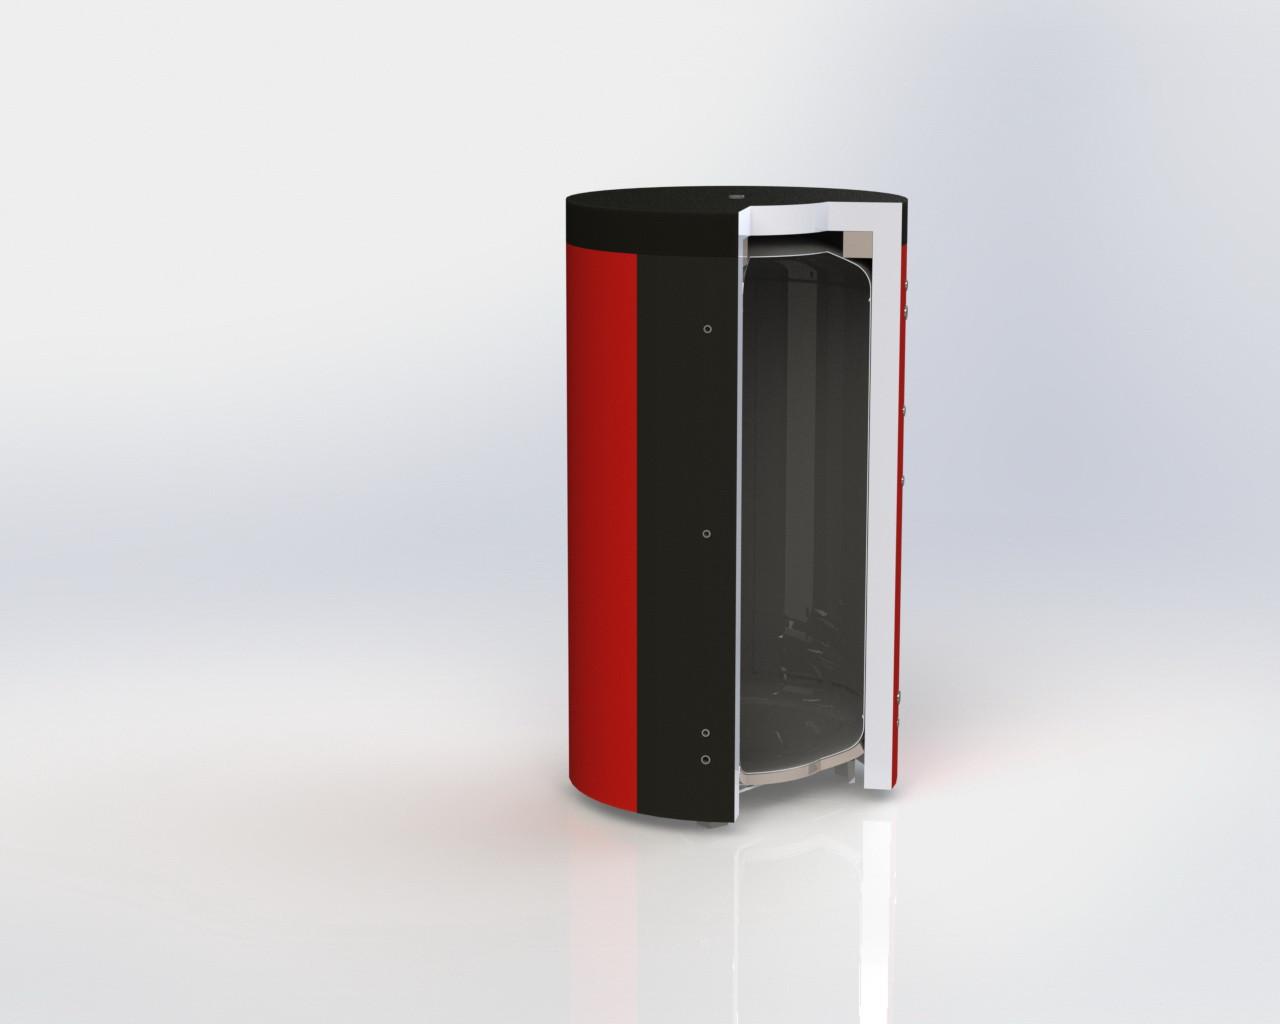 Теплоаккумулятор ЕА-00-1000 Kuydych с изоляцией